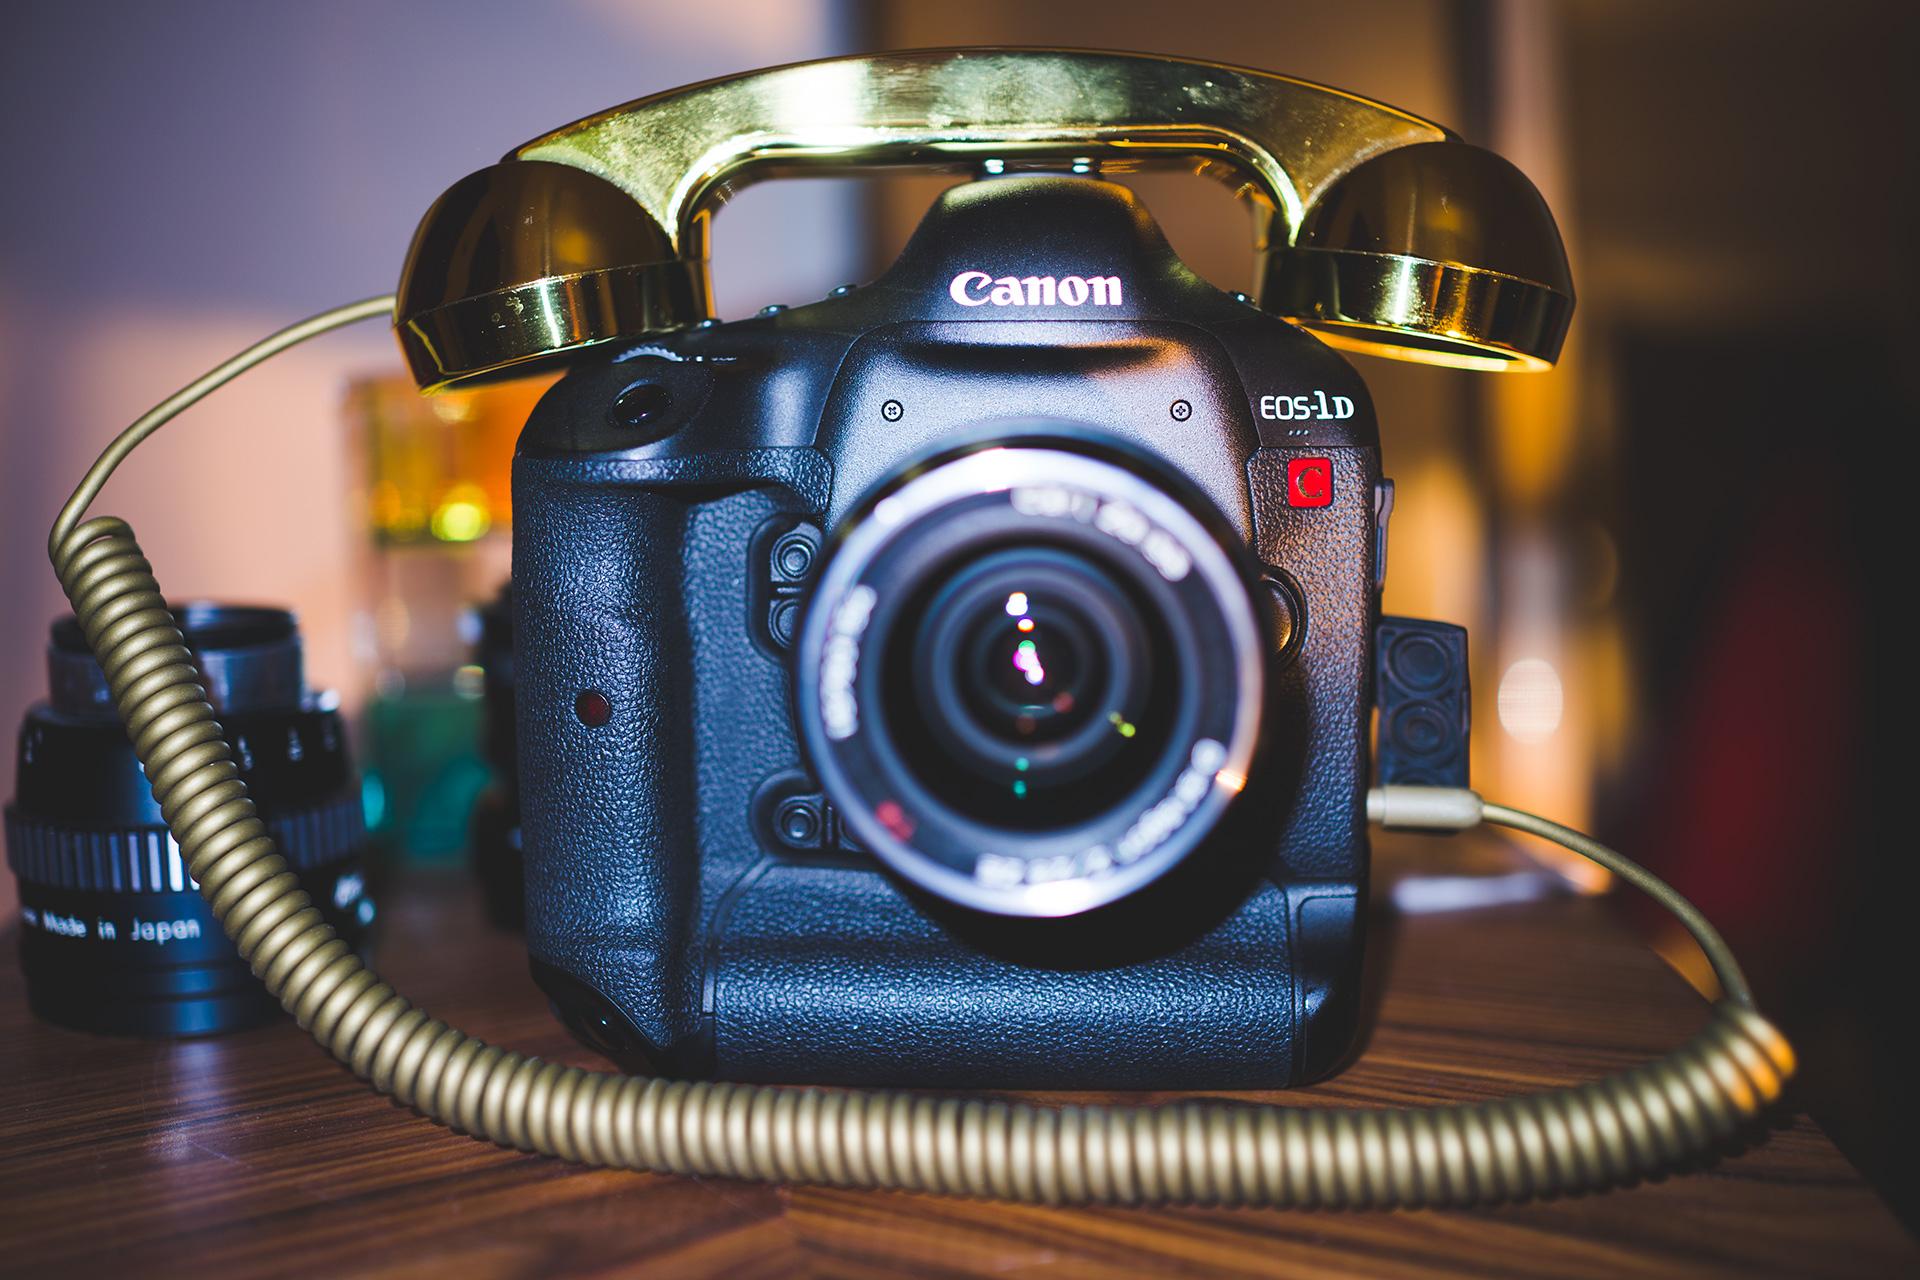 1dc-camera-phone.jpg